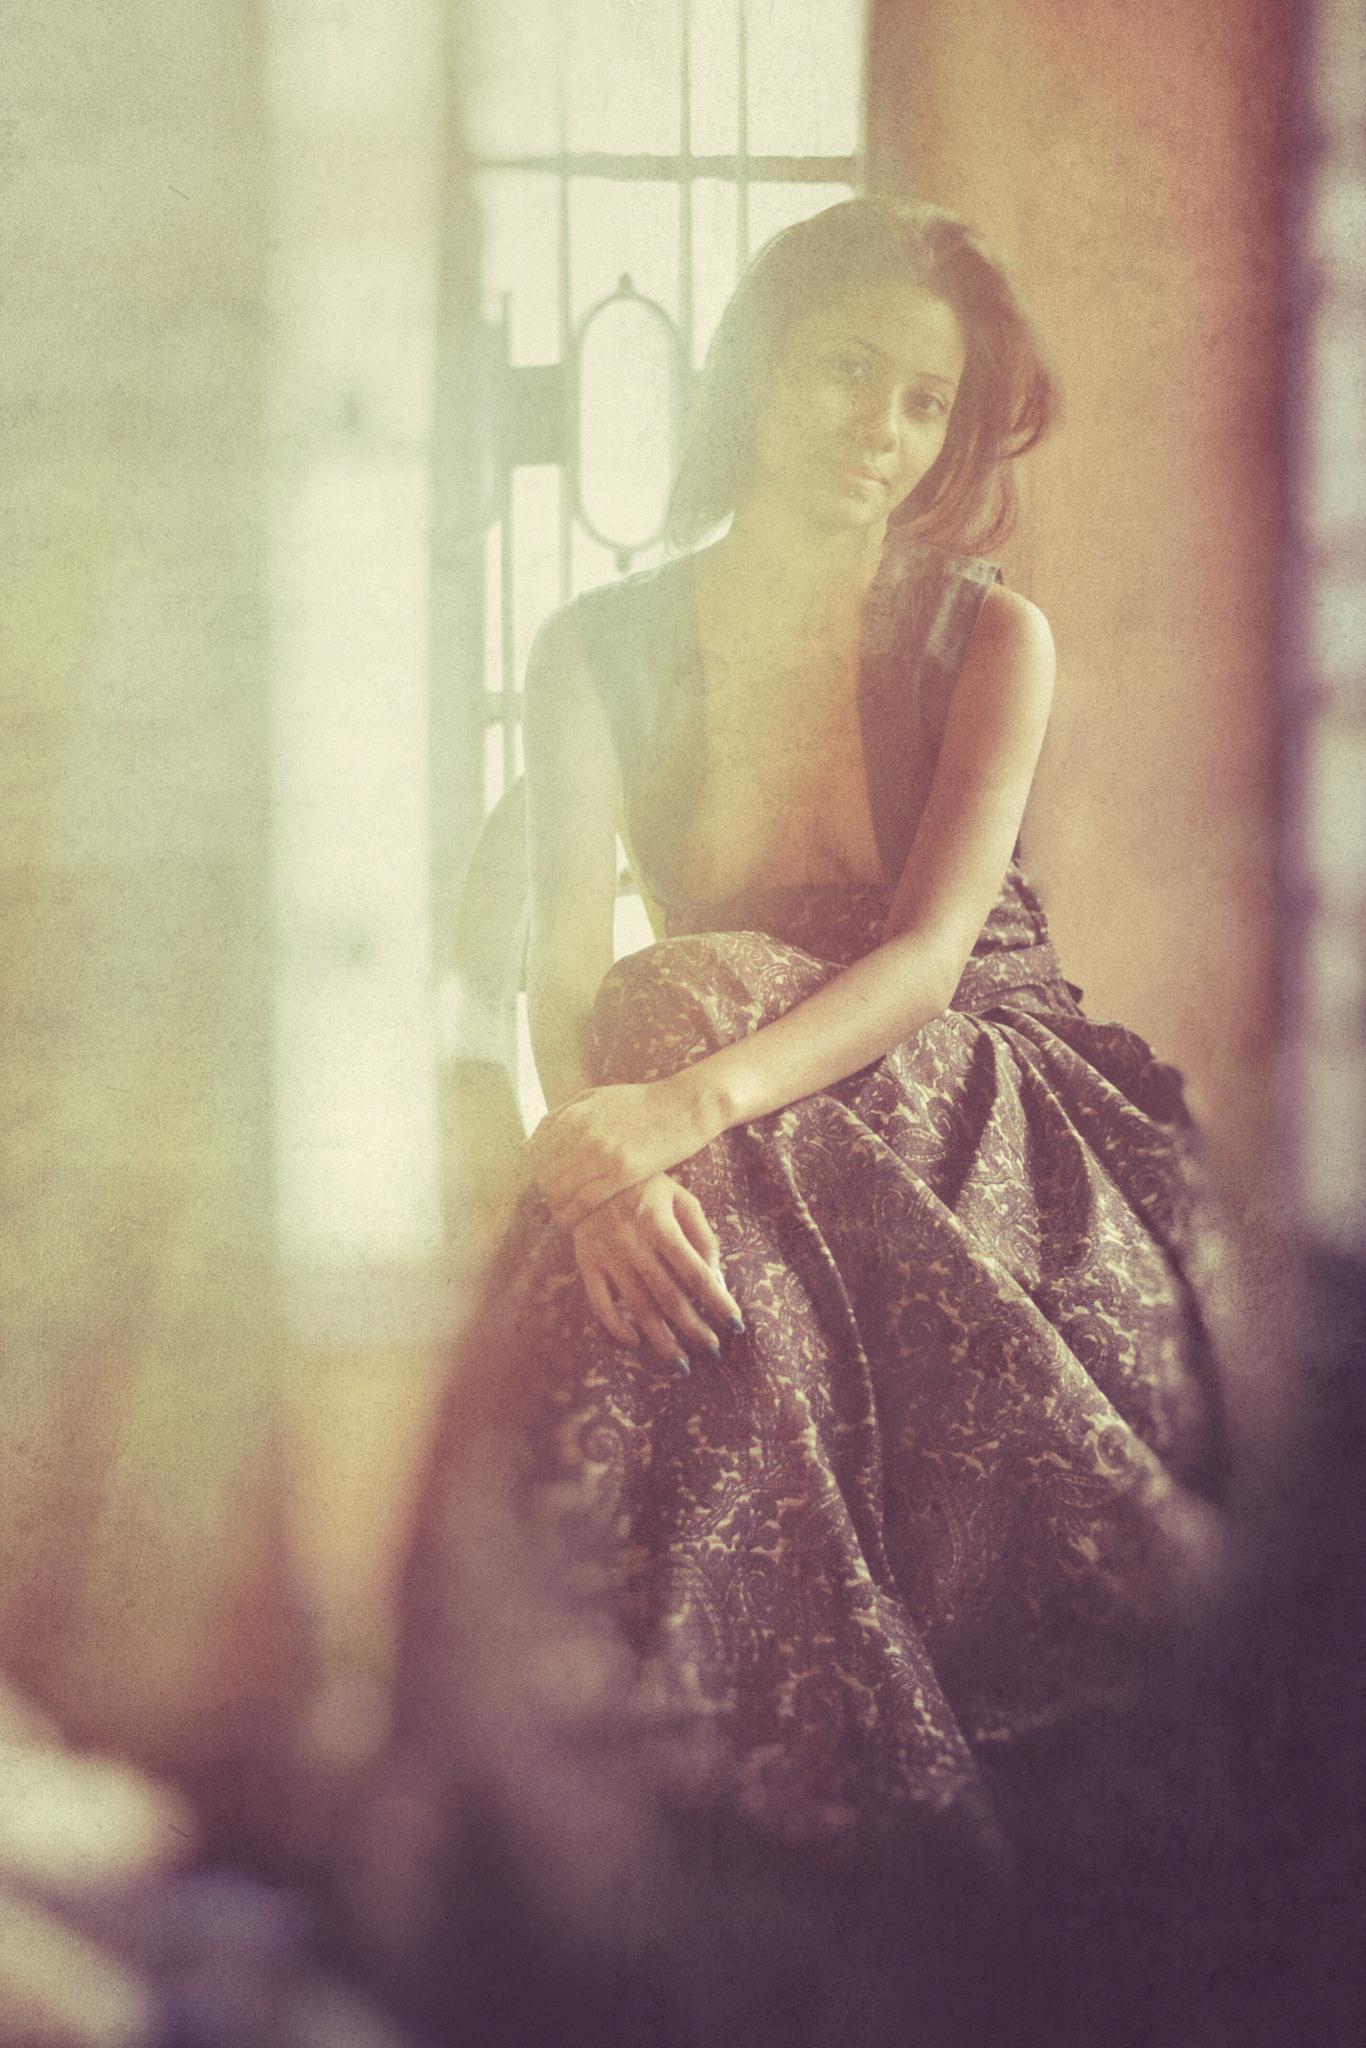 muse and melody  by Brotipriya Das